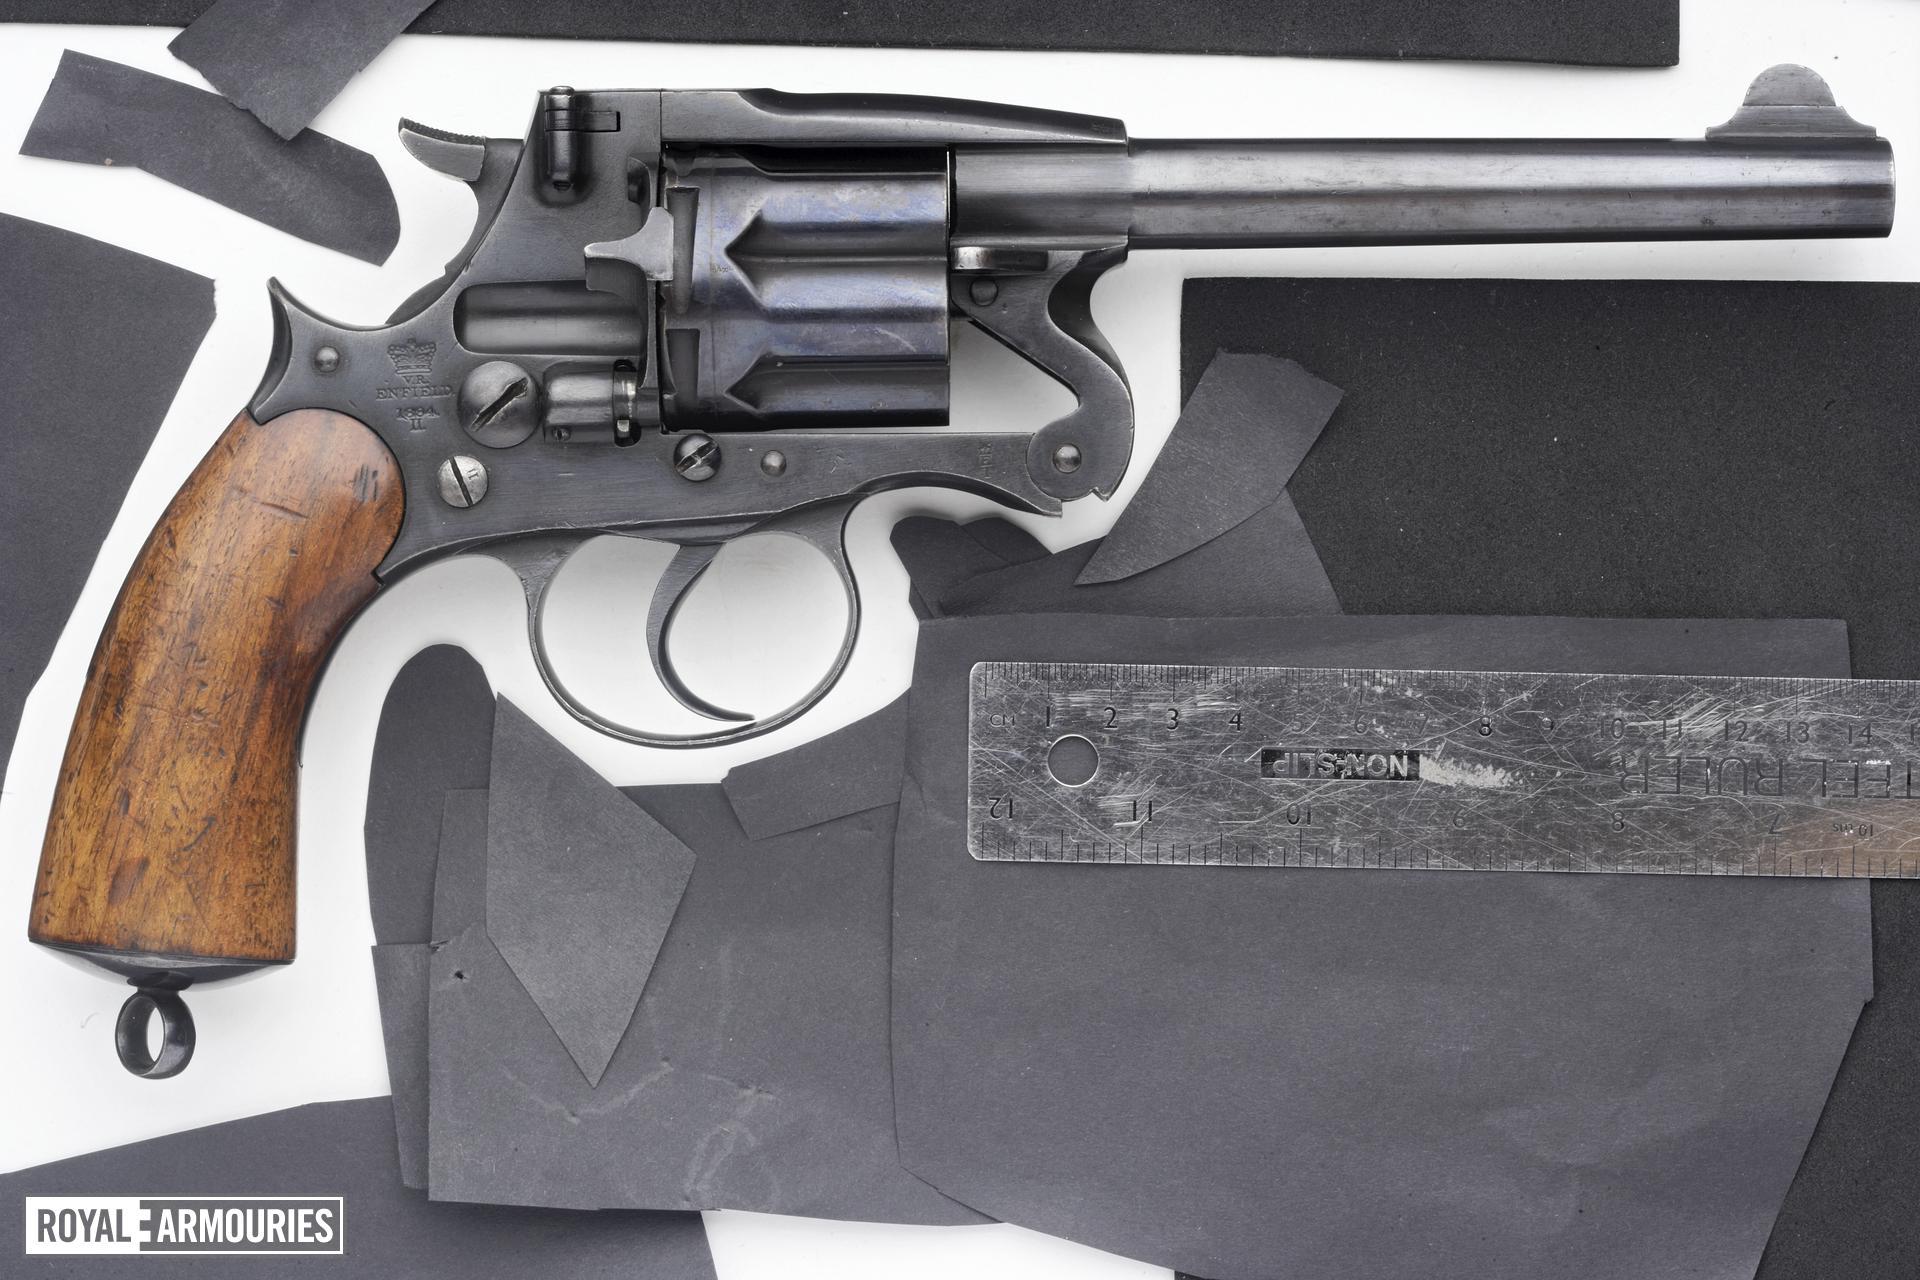 Centrefire six-shot revolver - Enfield Mk.II